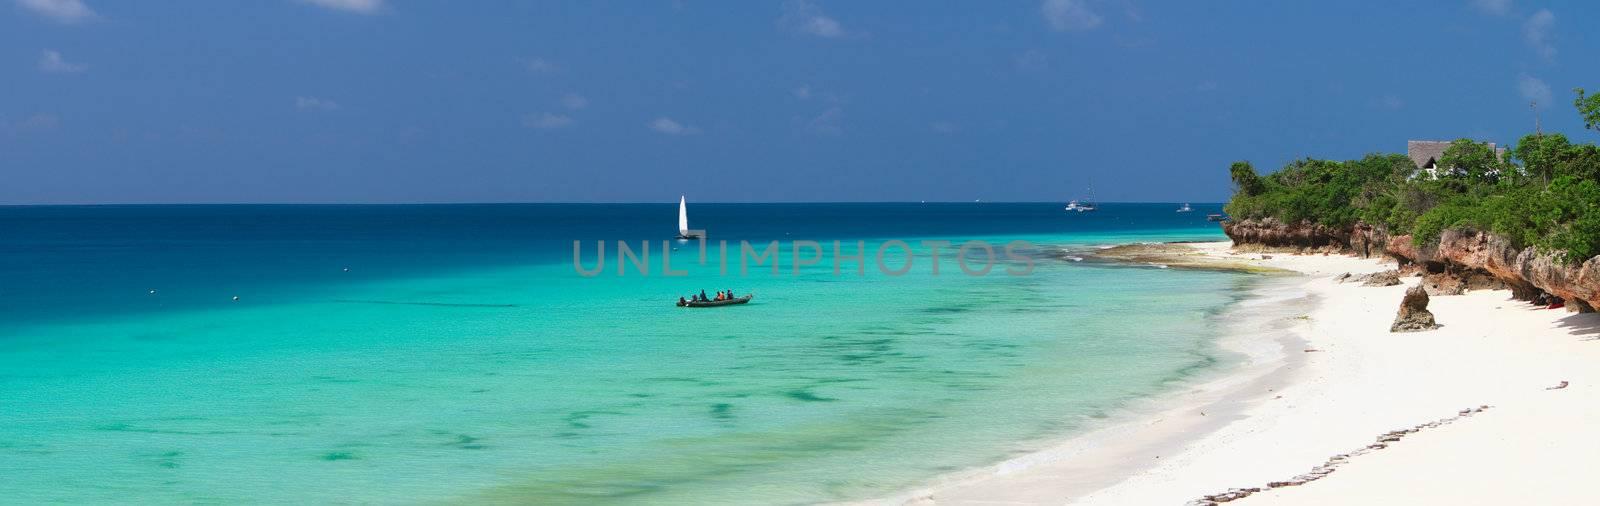 Beautiful landscape of white sand tropical beach on north-west coast of Zanzibar island